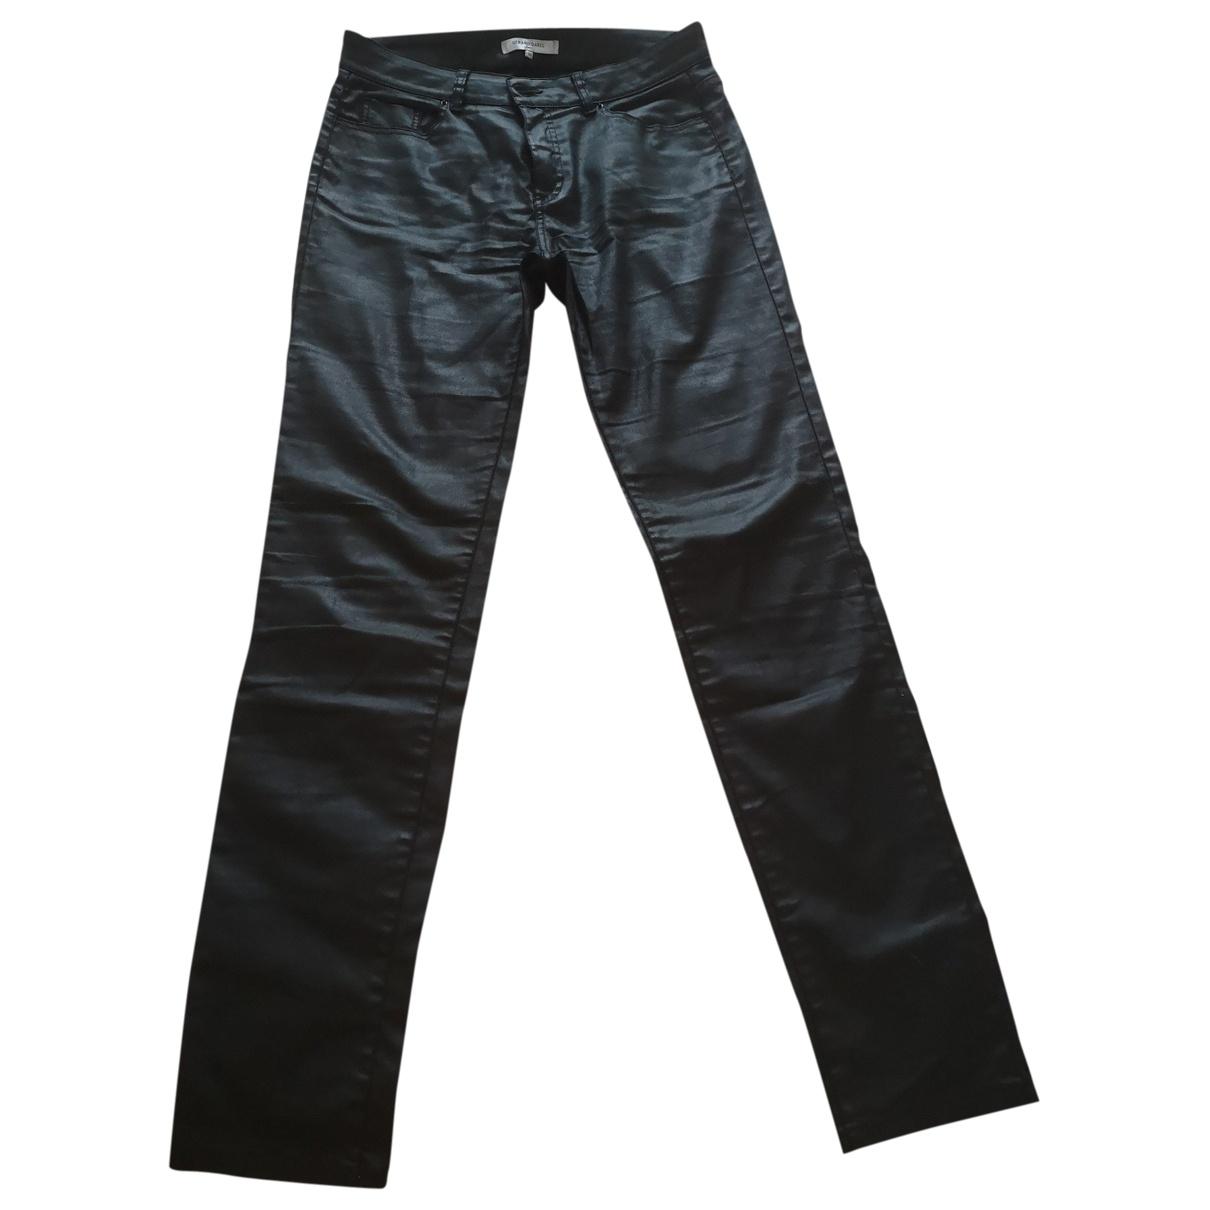 Gerard Darel \N Black Cotton - elasthane Jeans for Women 38 FR